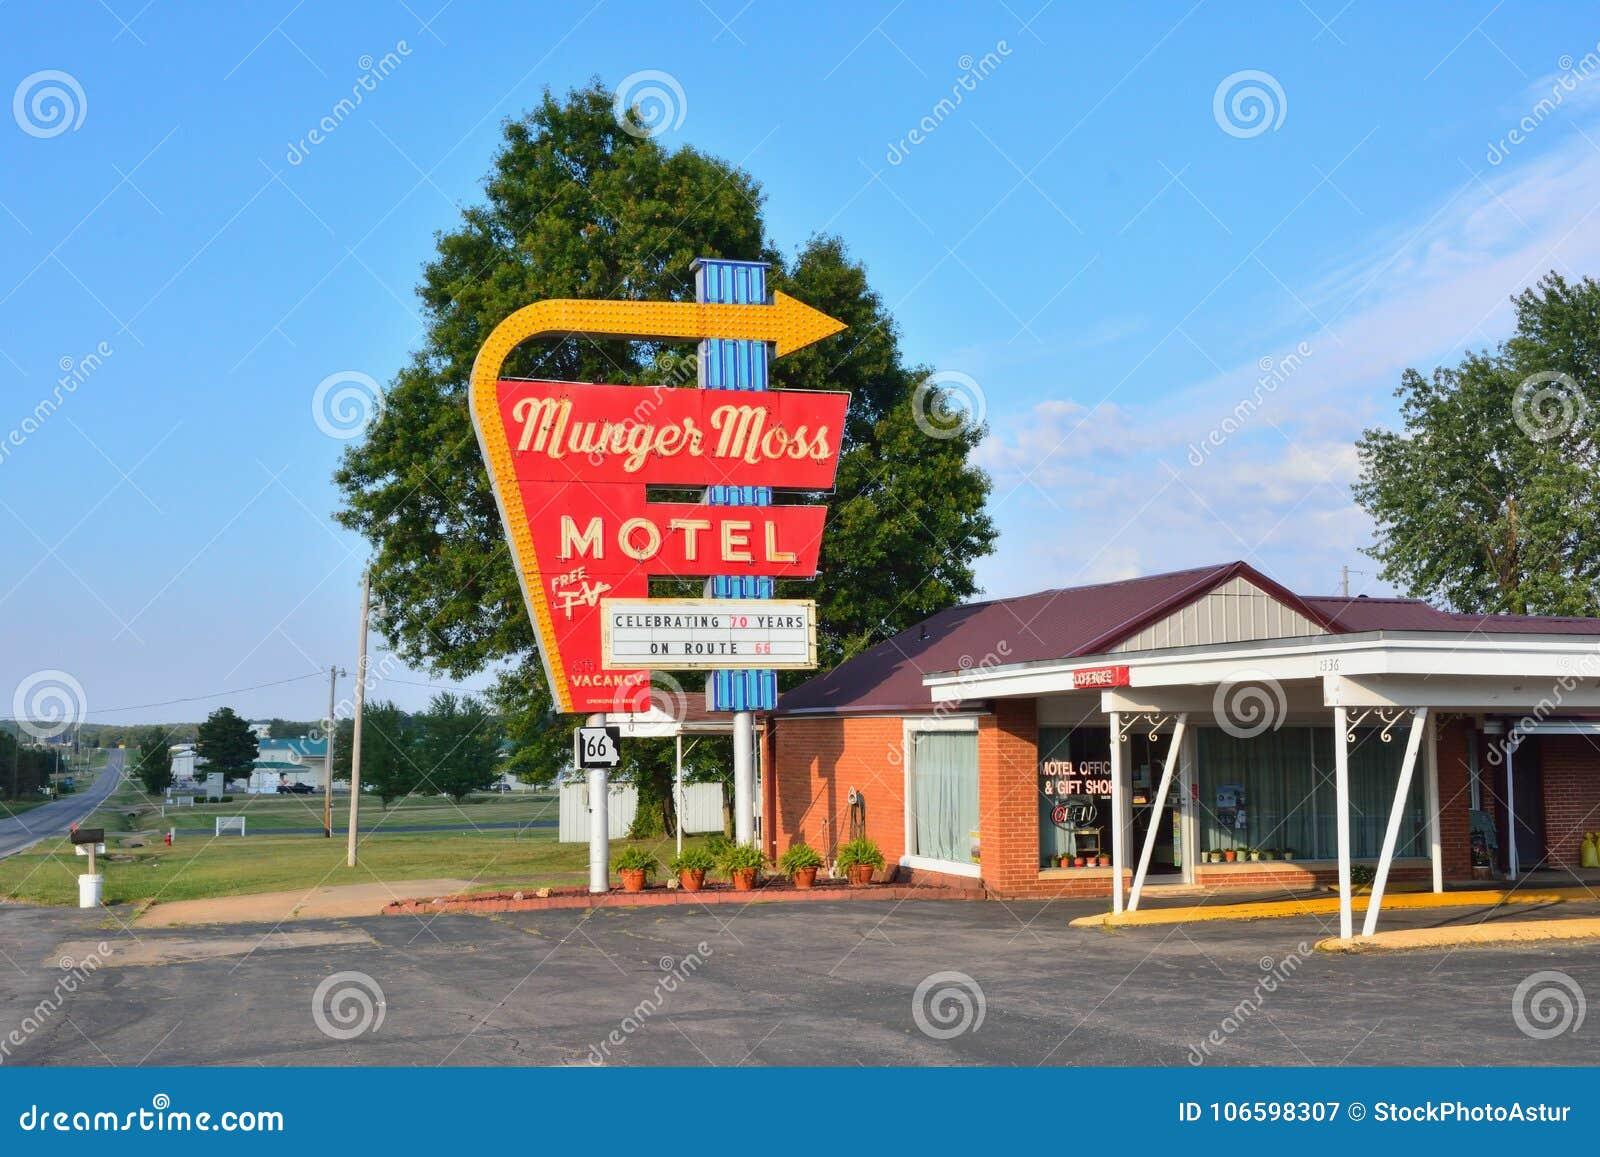 Munger Moss Motel en uitstekend neonteken